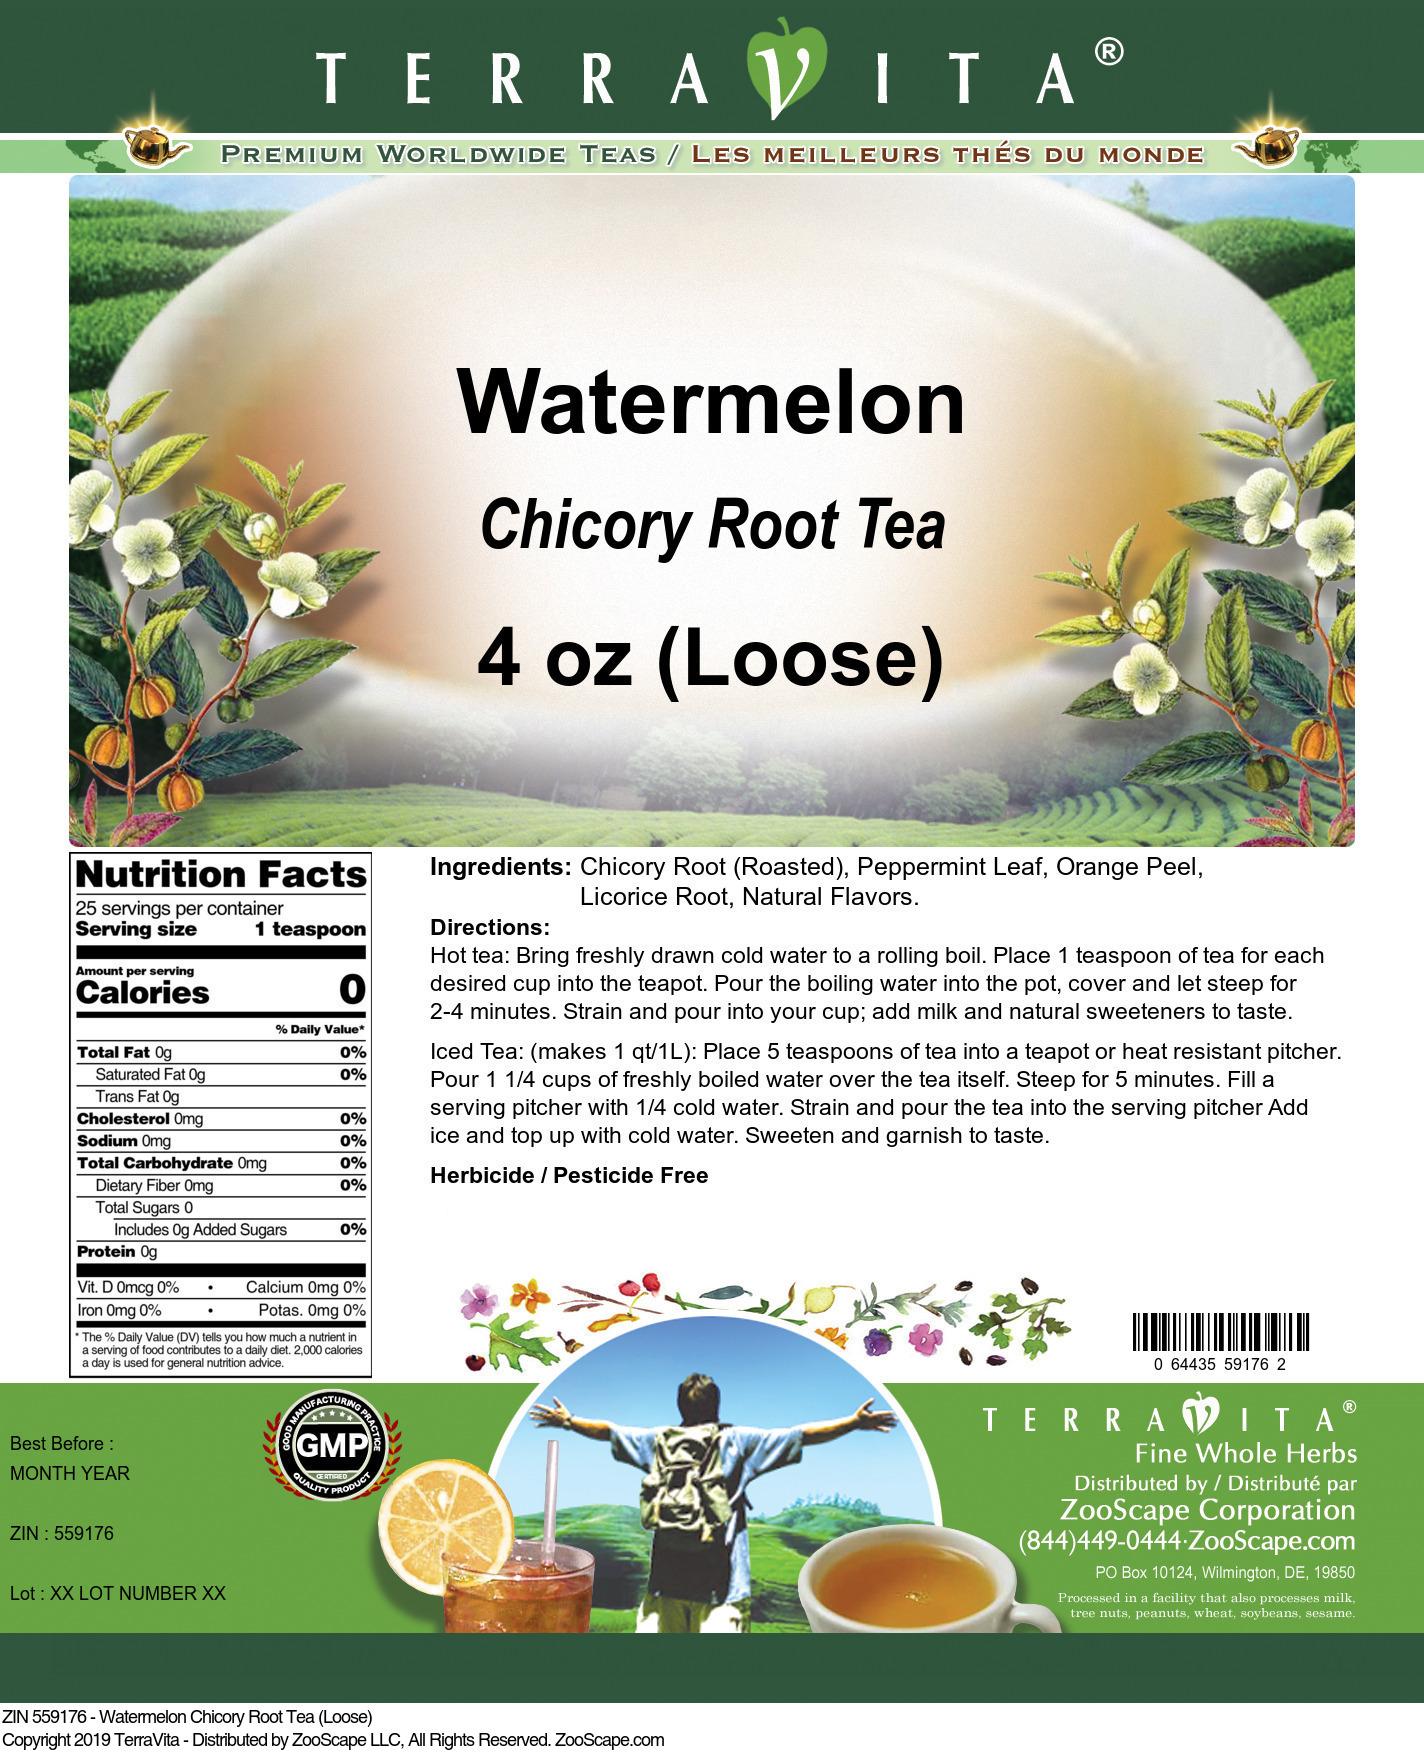 Watermelon Chicory Root Tea (Loose)